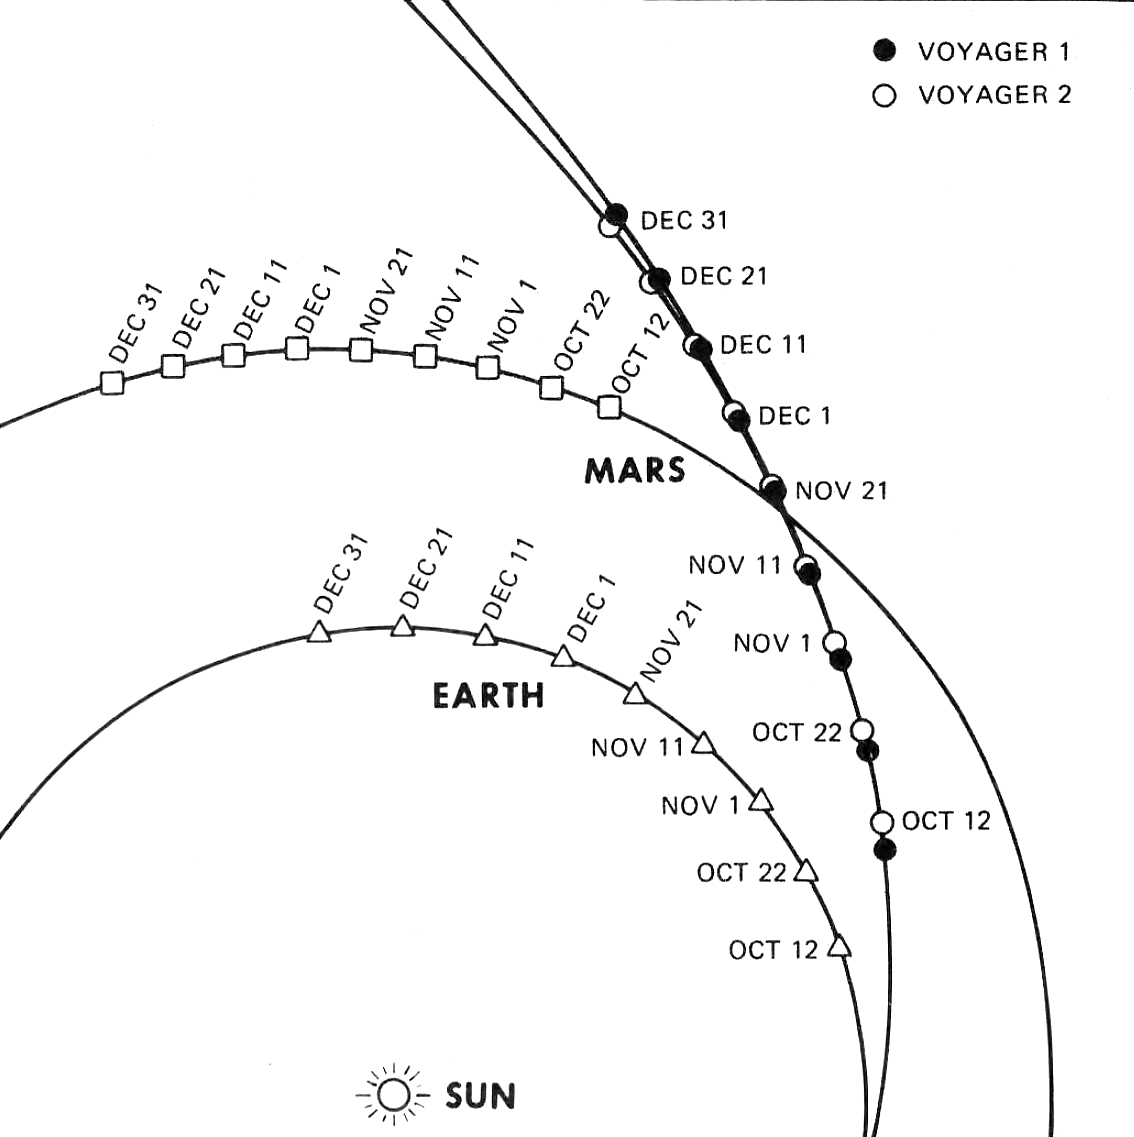 Voyager 1 Diagram Page 3